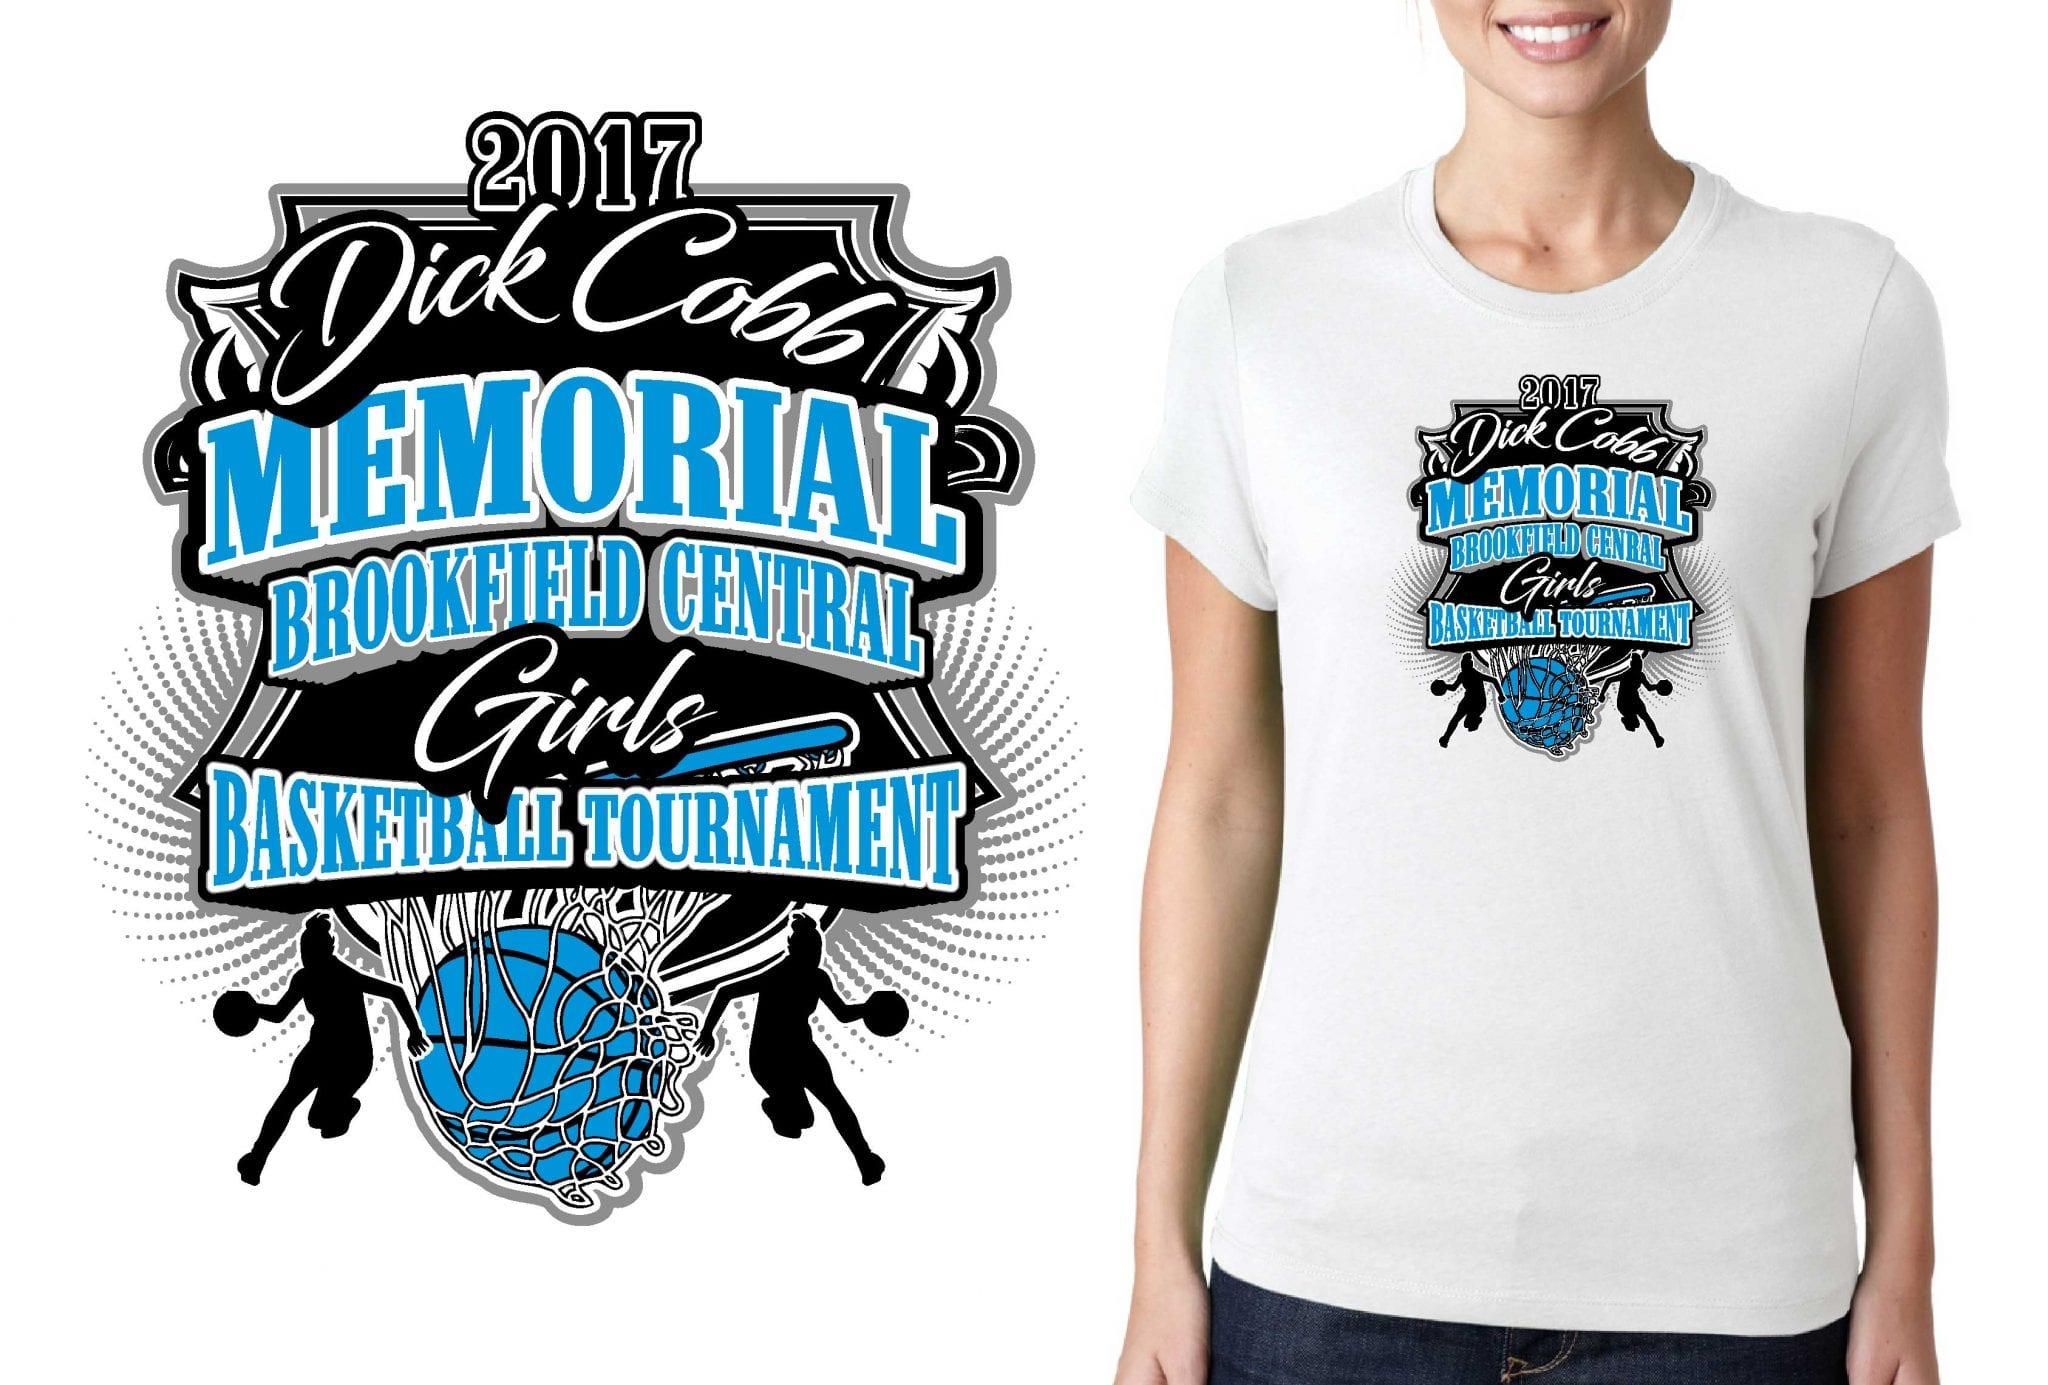 2017 Dick Cobb Memorial Brookfield Central Girls Basketball vector logo design for t-shirt urartstudio.com